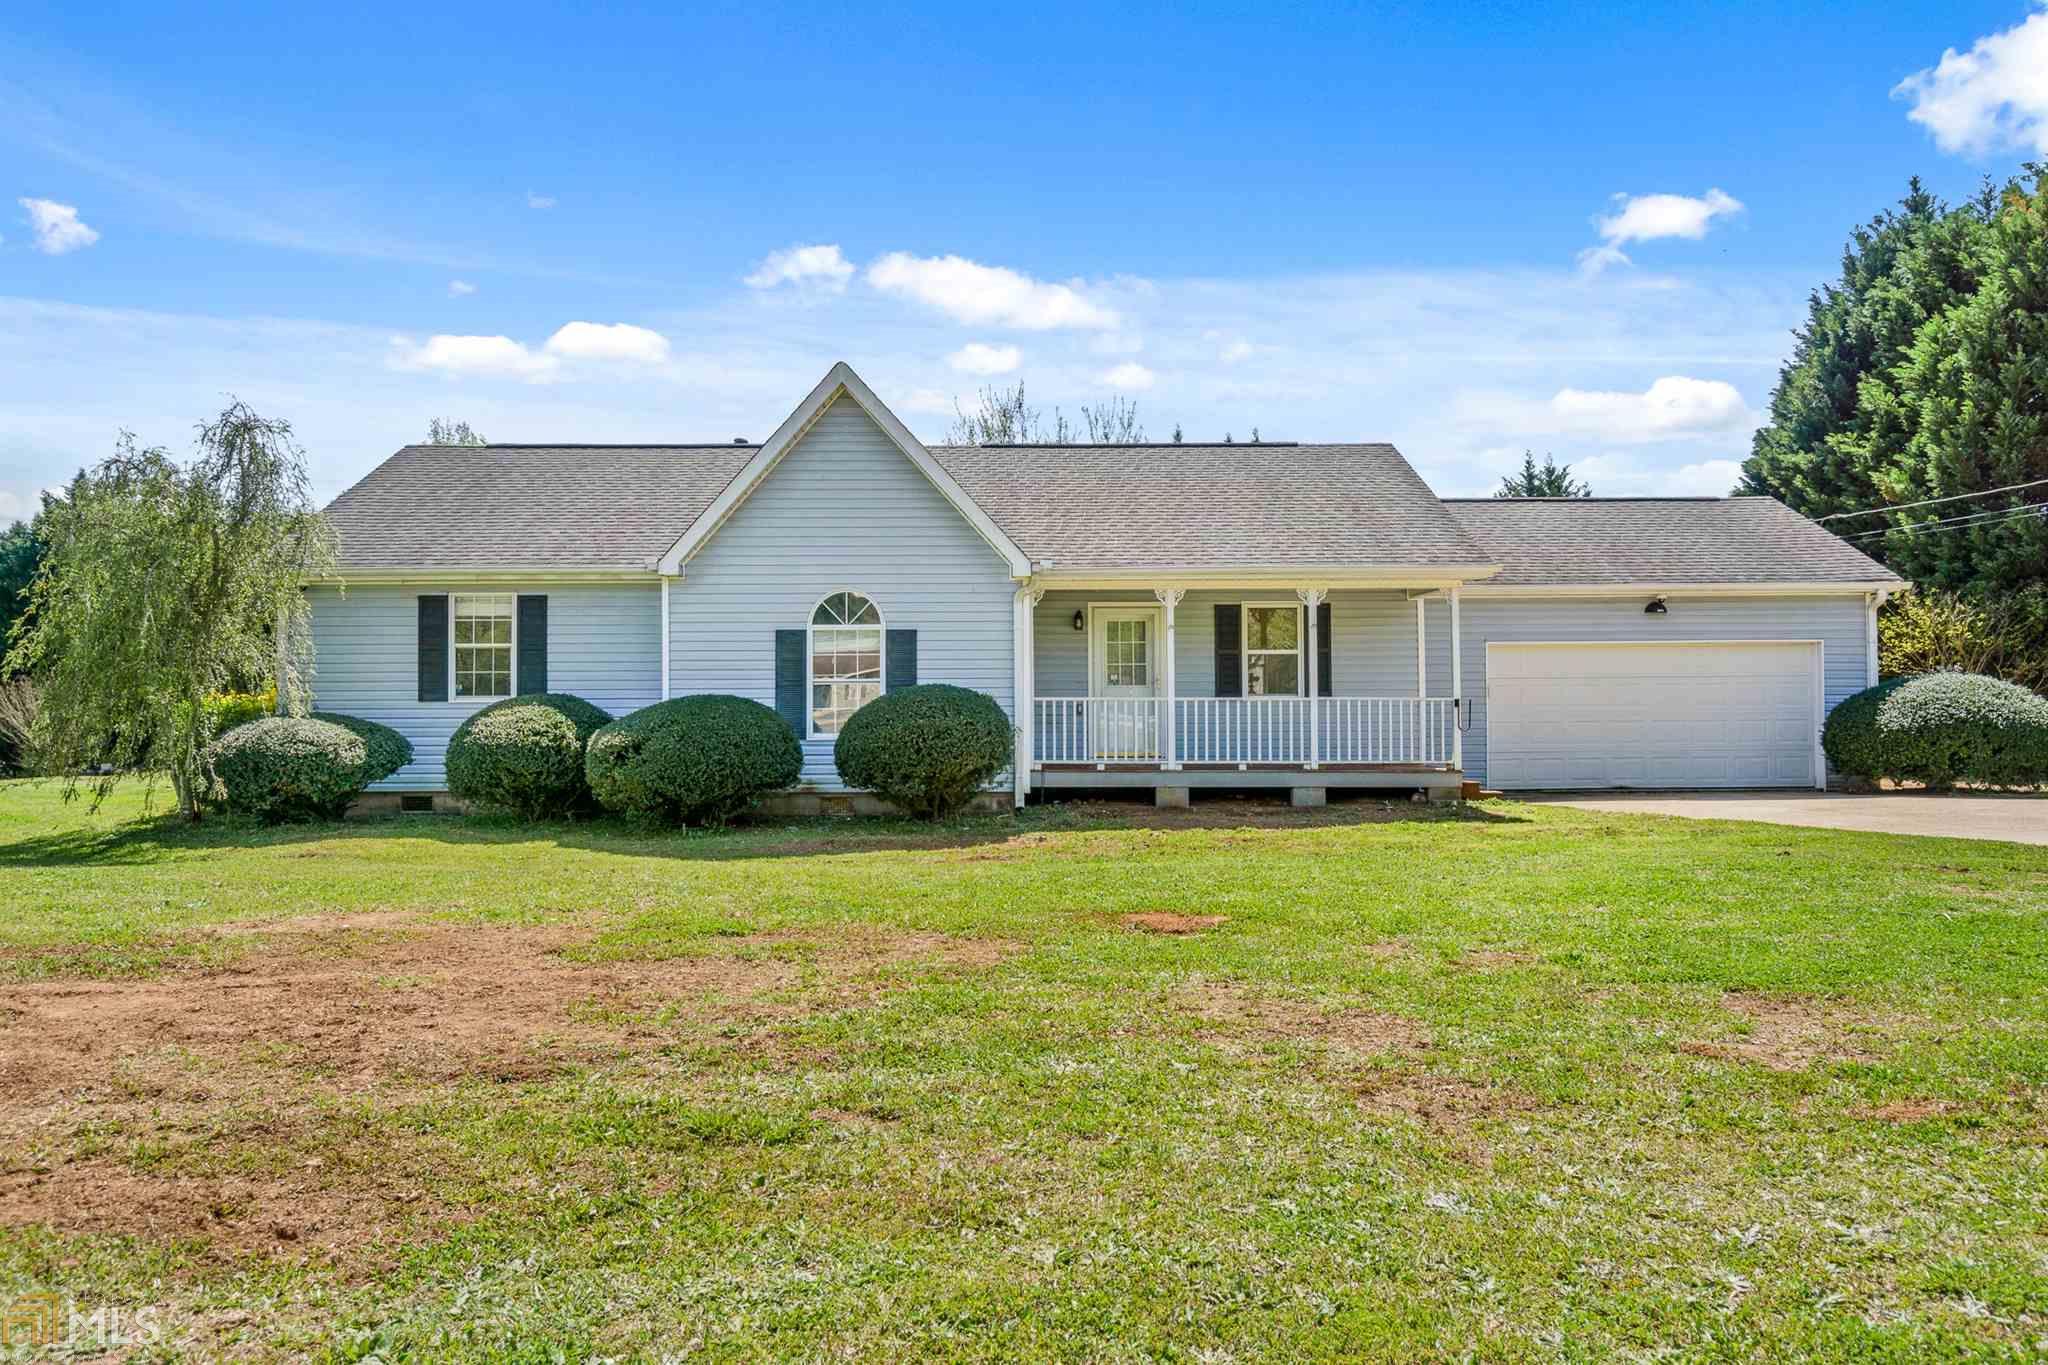 770 Laney Rd, Locust Grove, Georgia 30248, 3 Bedrooms Bedrooms, ,2 BathroomsBathrooms,Single Family,For Sale,770 Laney Rd,1,8960886